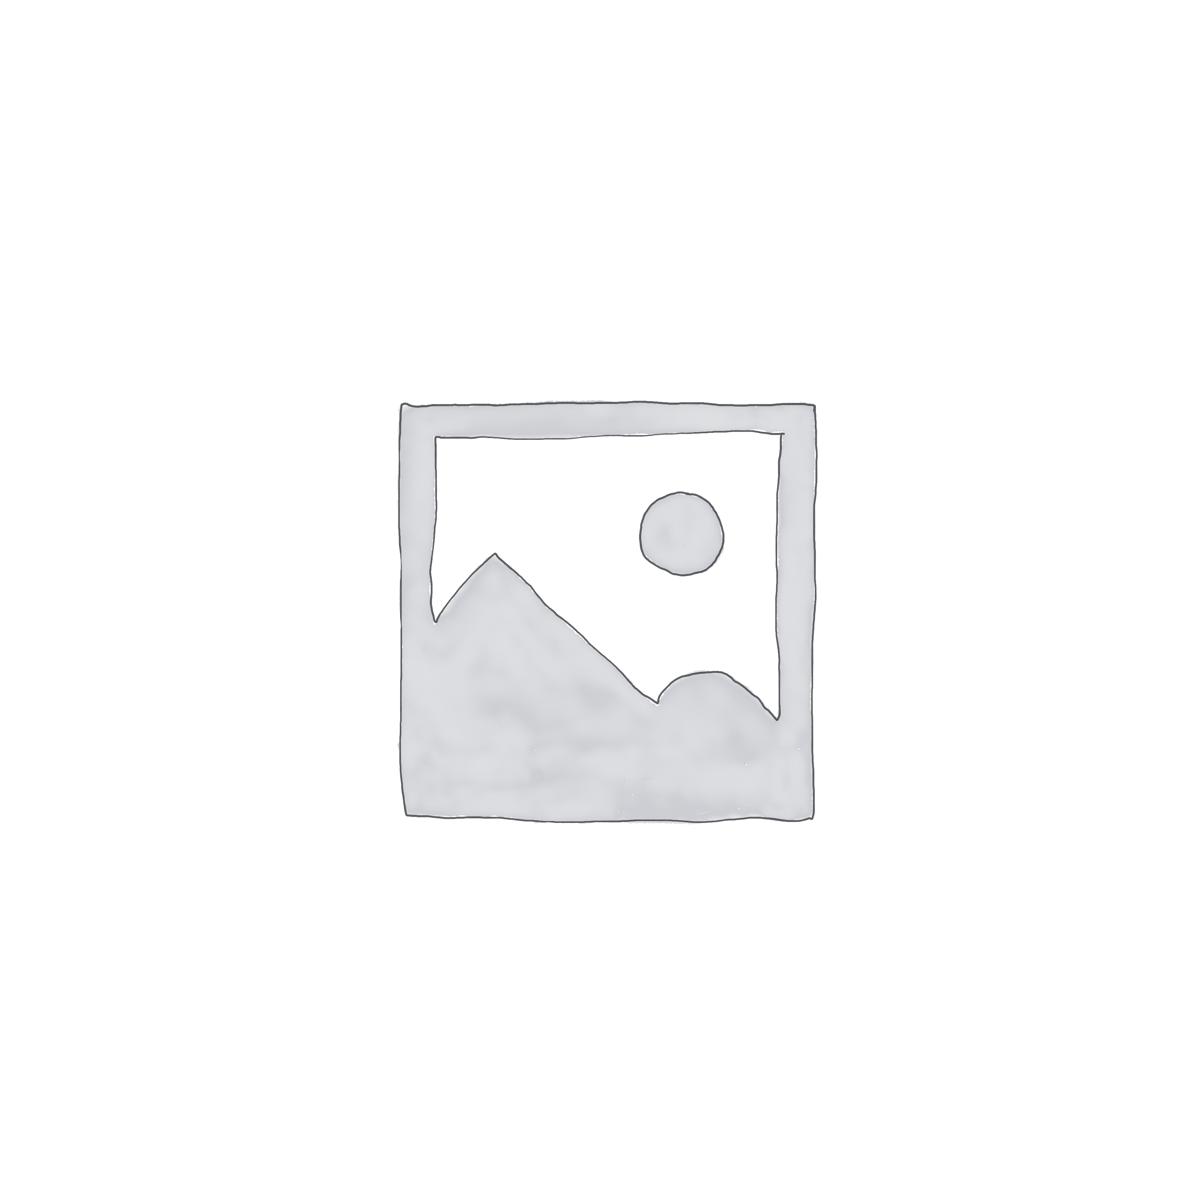 Cartoon Animals on Music Notes Wallpaper Mural